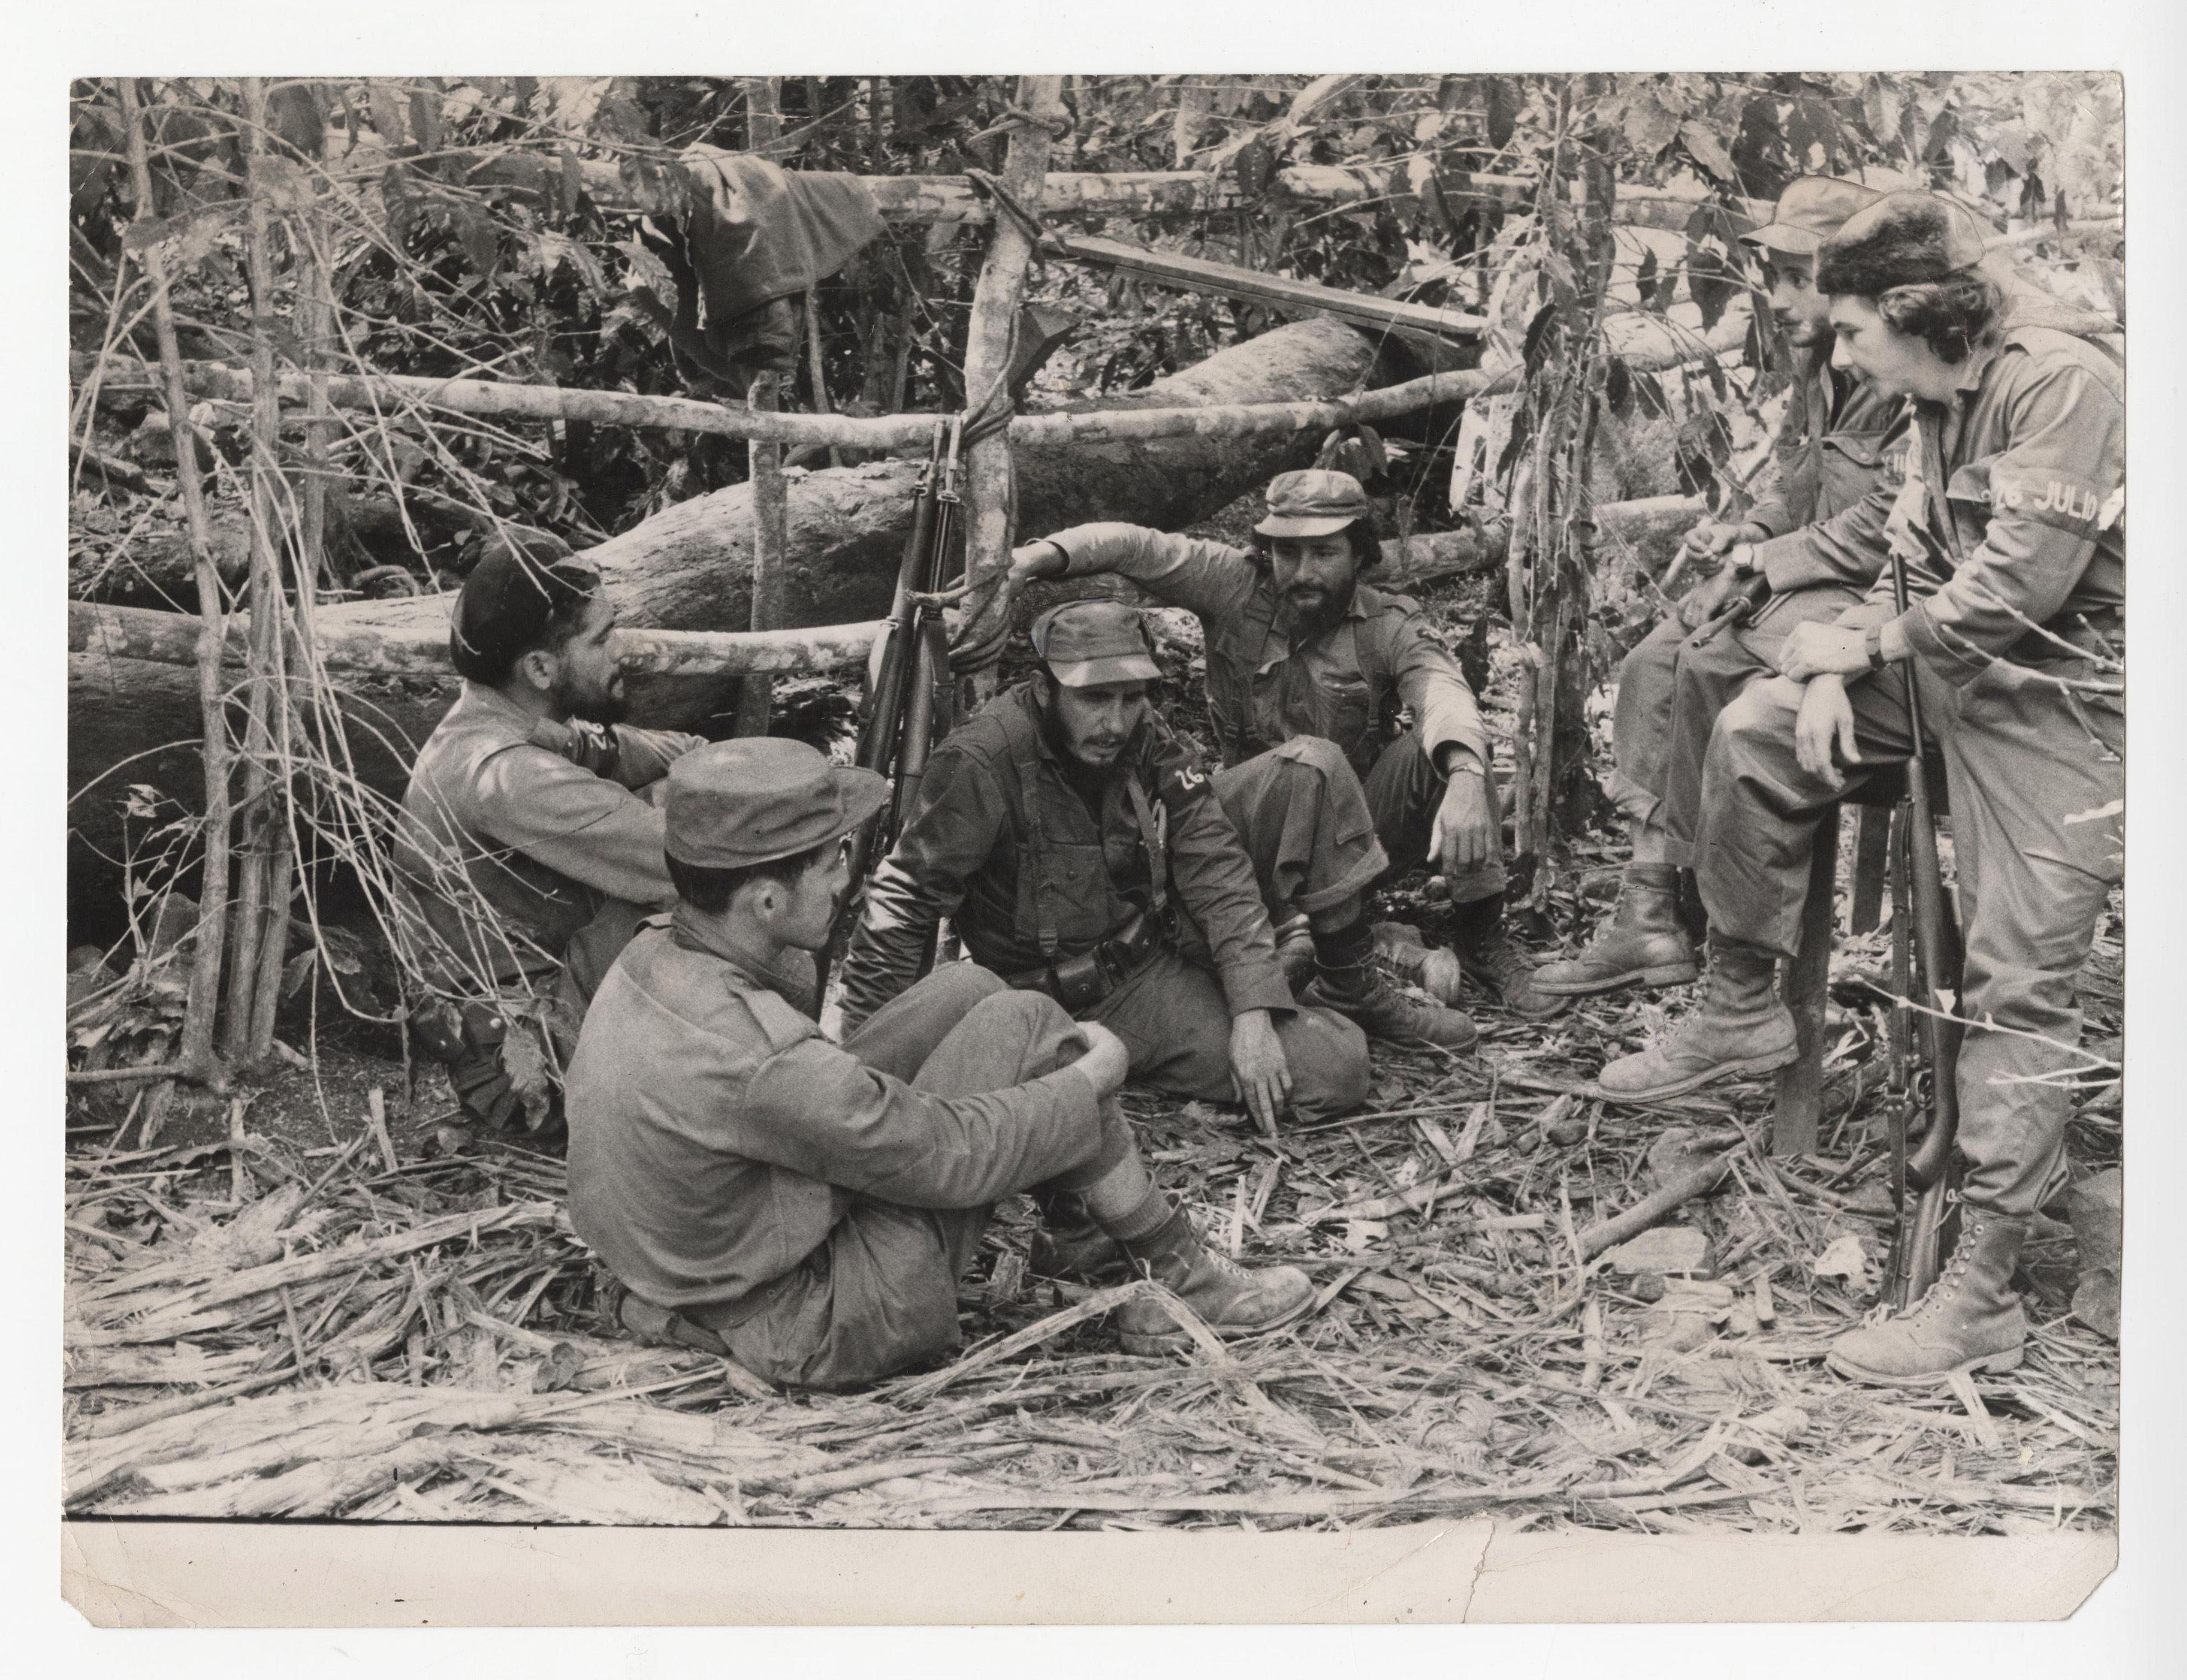 Fidel Castro & Soldiers, Superb Original Official Photo